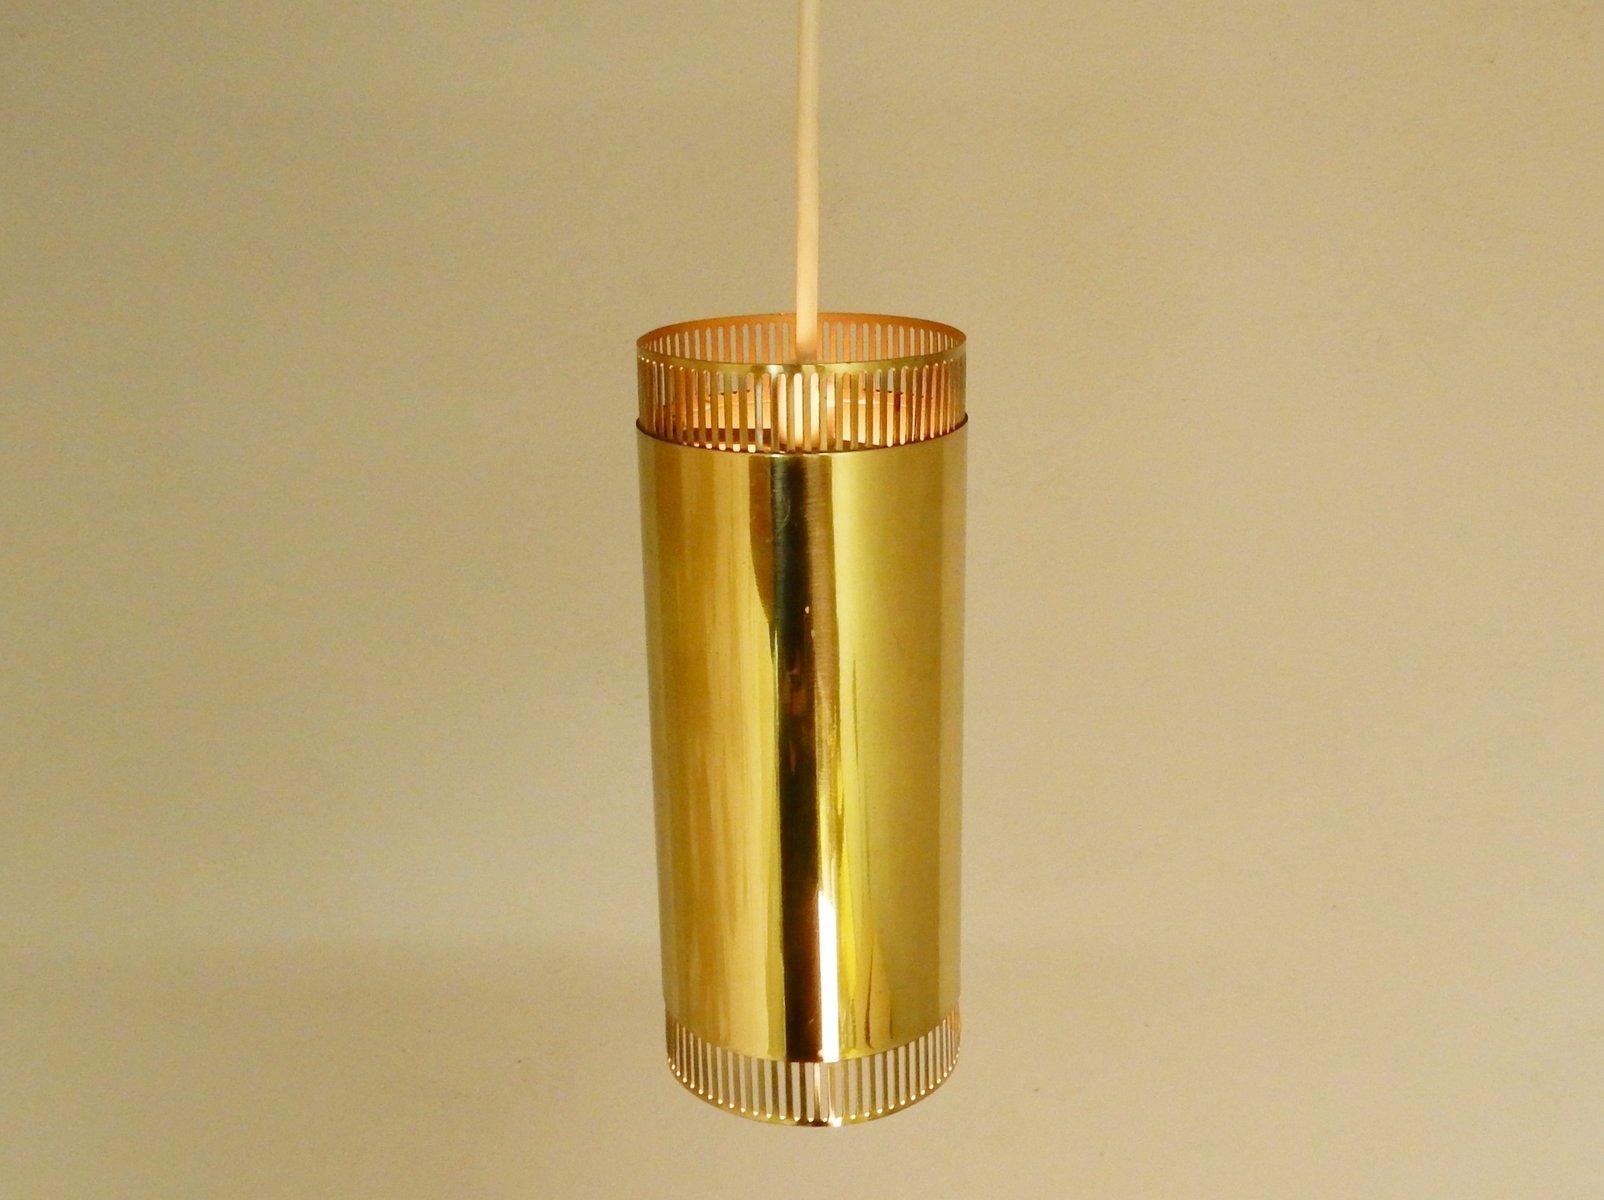 Scandinavian brass pendant lights 1960s set of 3 for sale at pamono scandinavian brass pendant lights 1960s set of 3 aloadofball Image collections